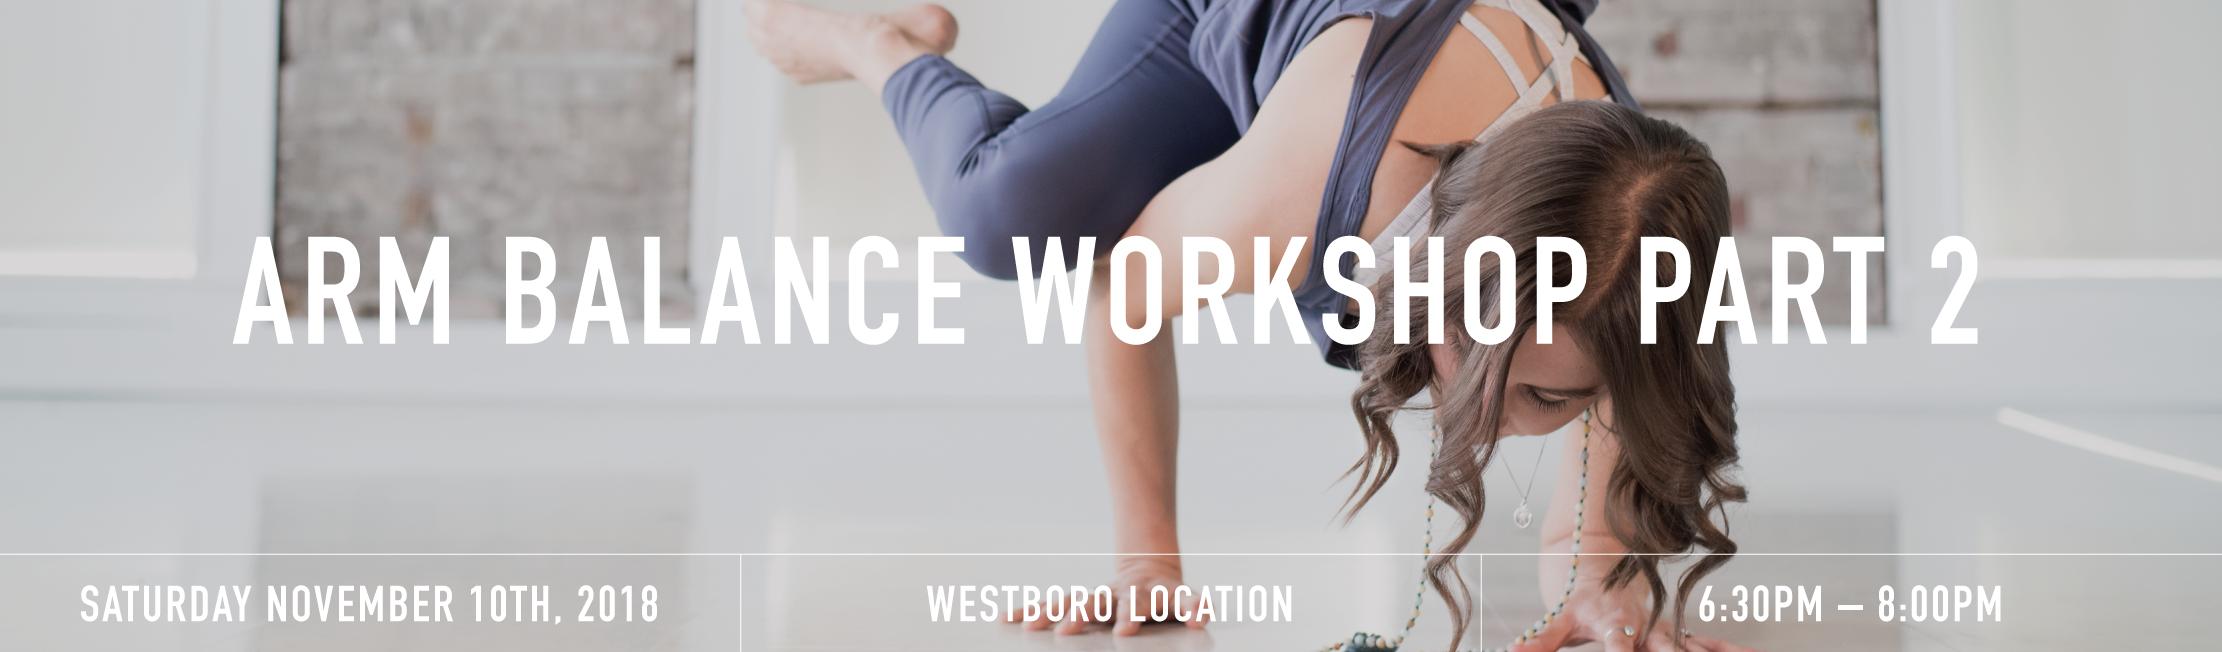 Arm balance workshop banner  1